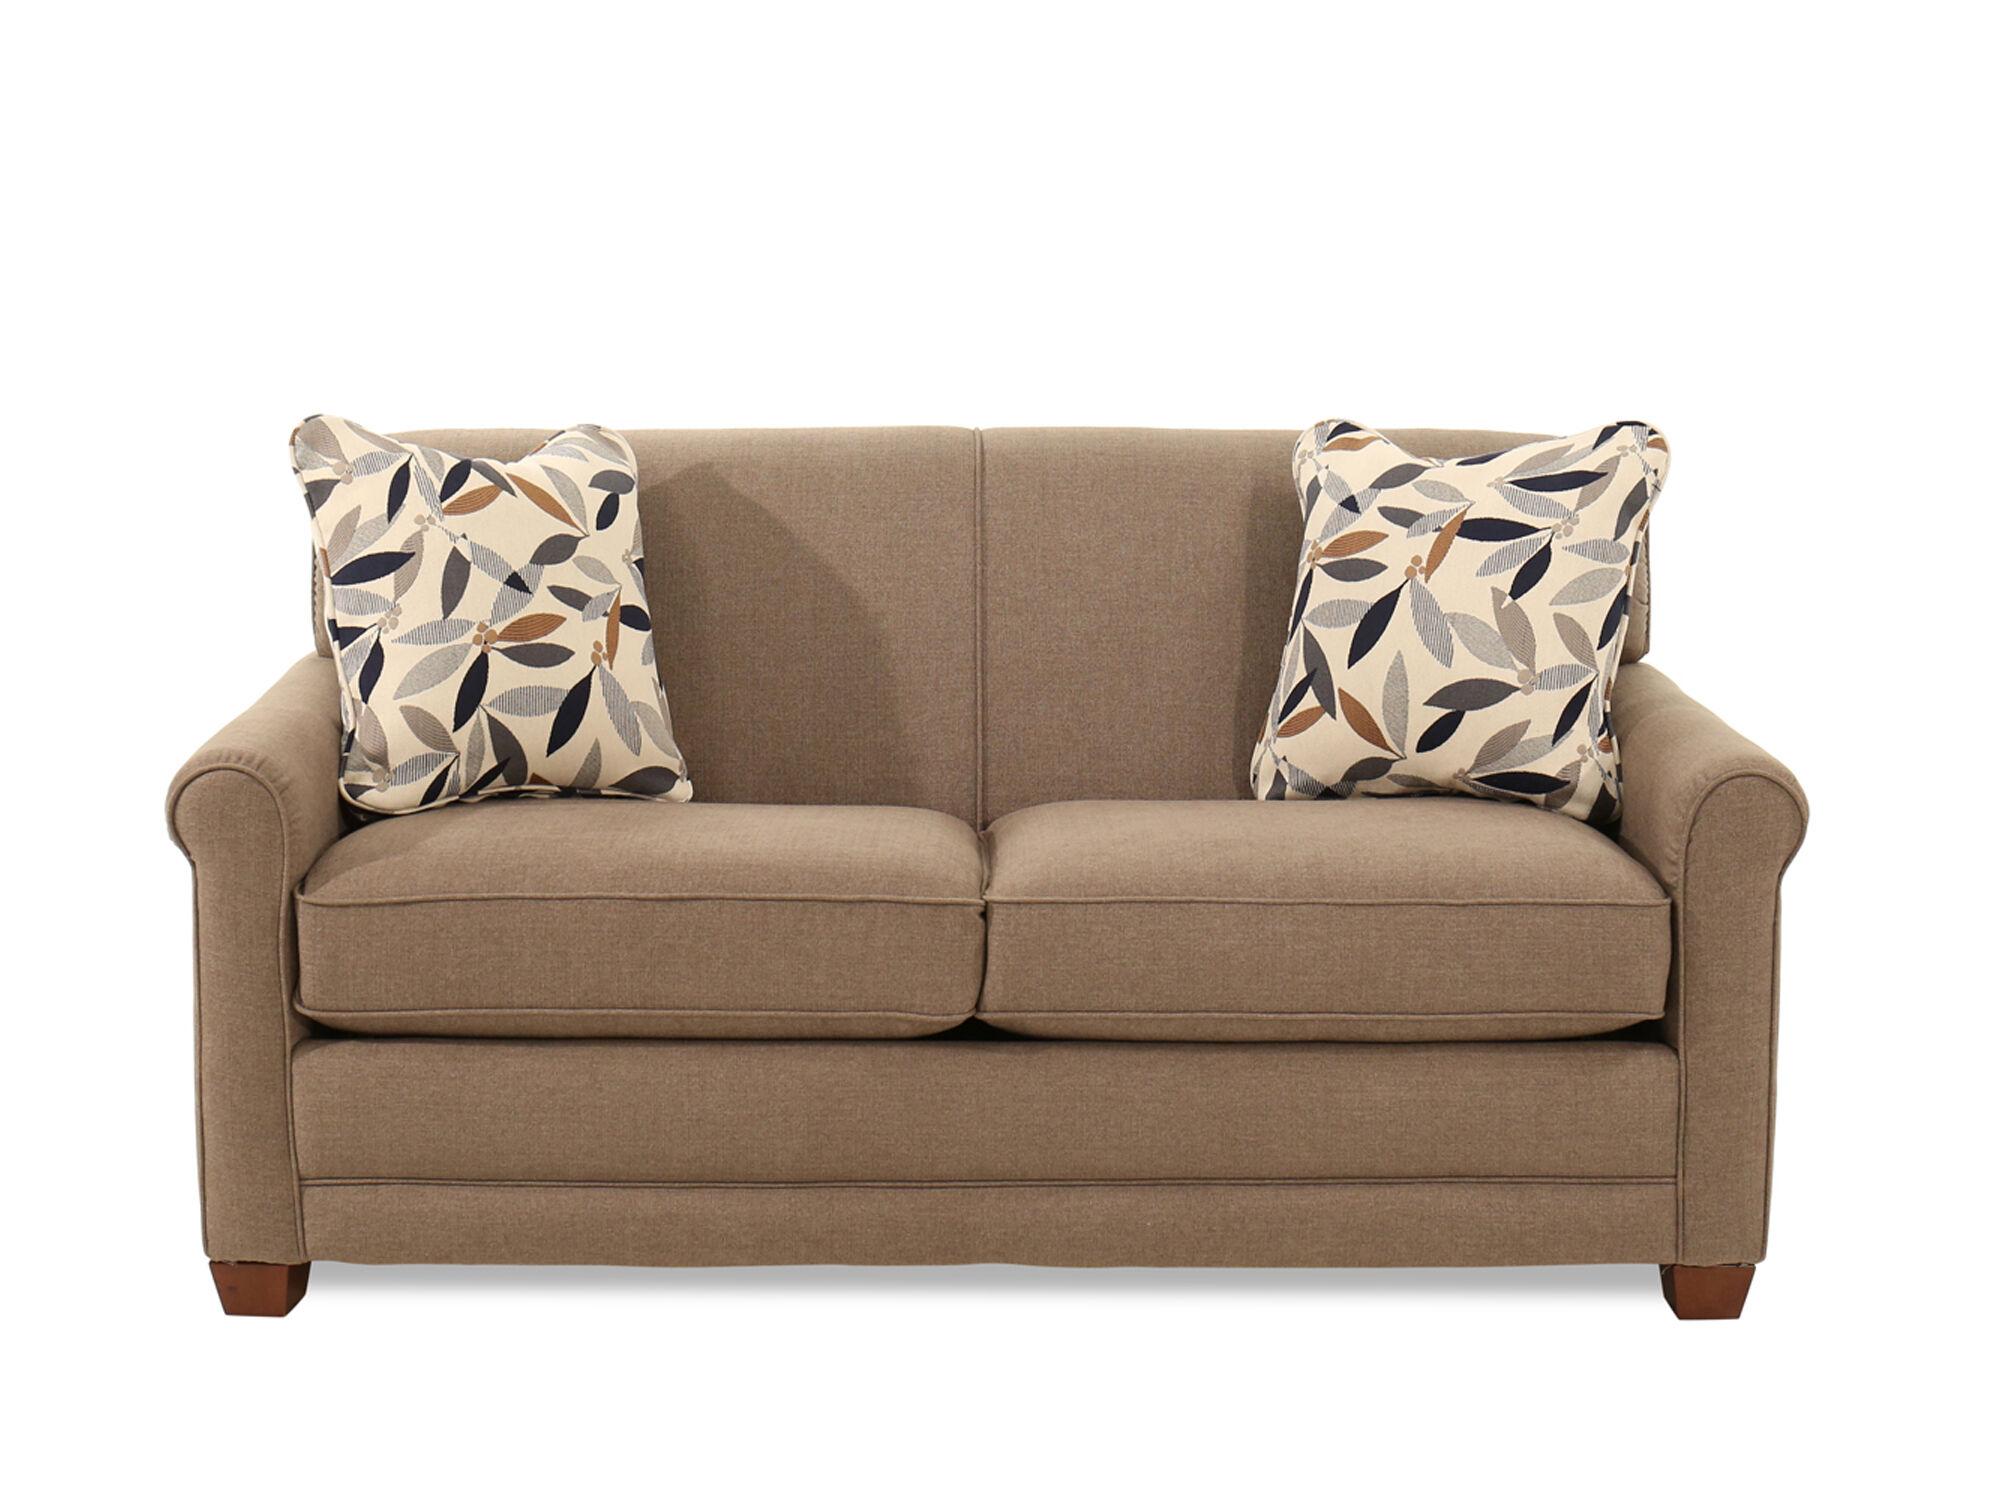 Genial Traditional 71u0026quot; Full Sleeper Sofa In Brown